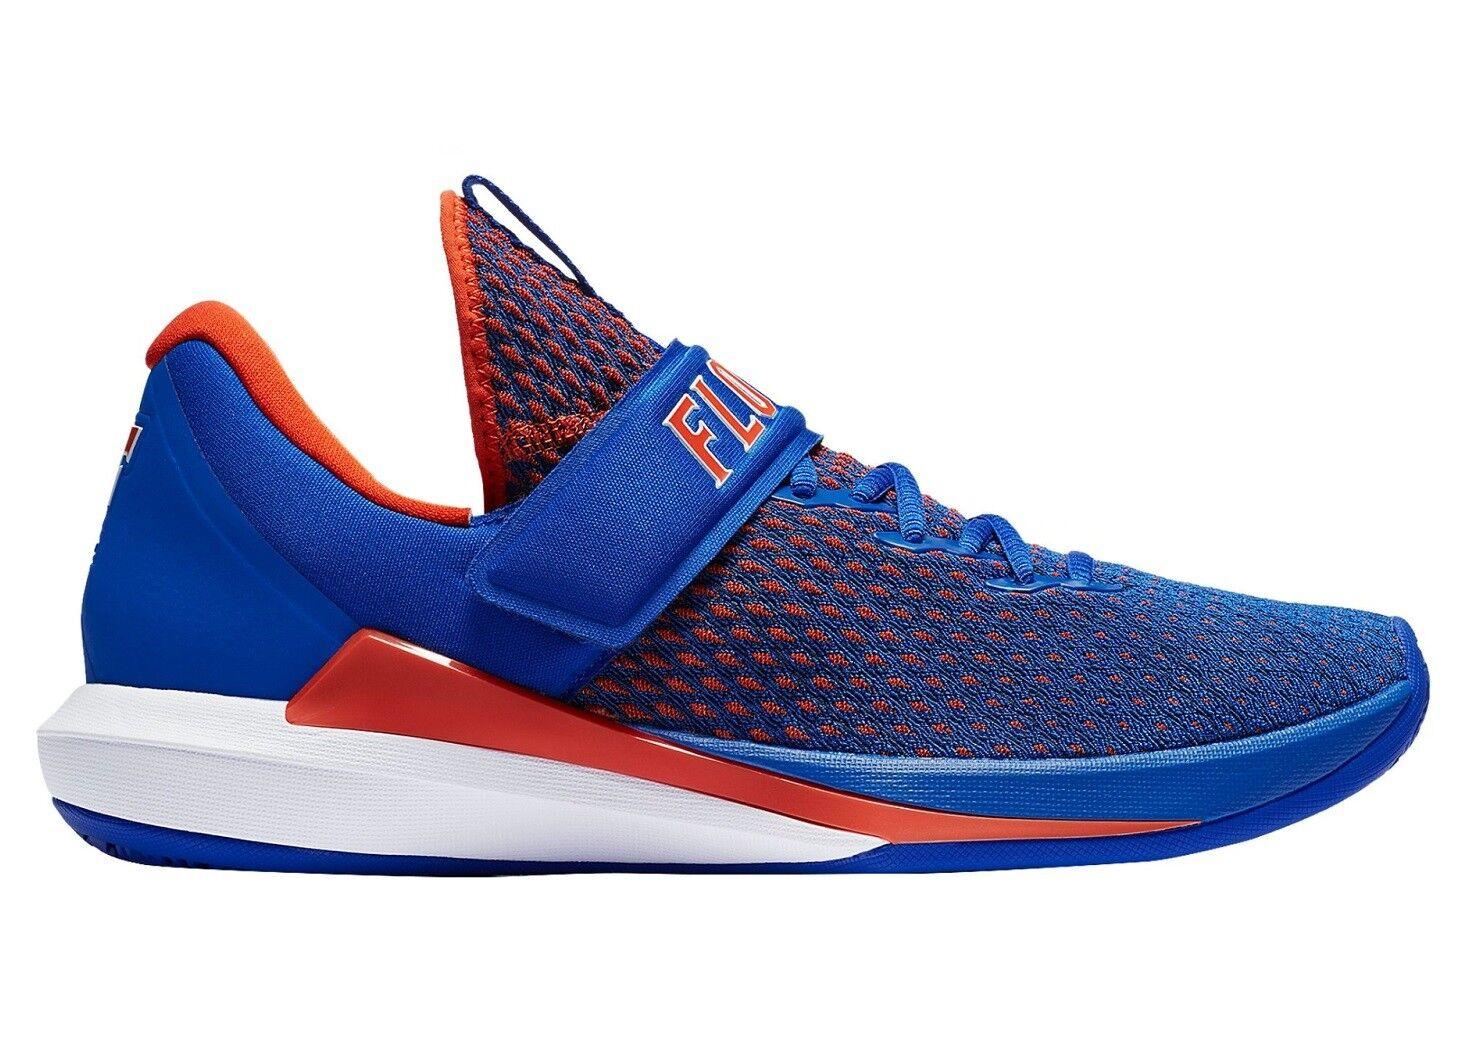 Jordan Trainer 3 Florida Mens  AR1402 -400 Royal arancia Training scarpe Dimensione 10.5  in linea